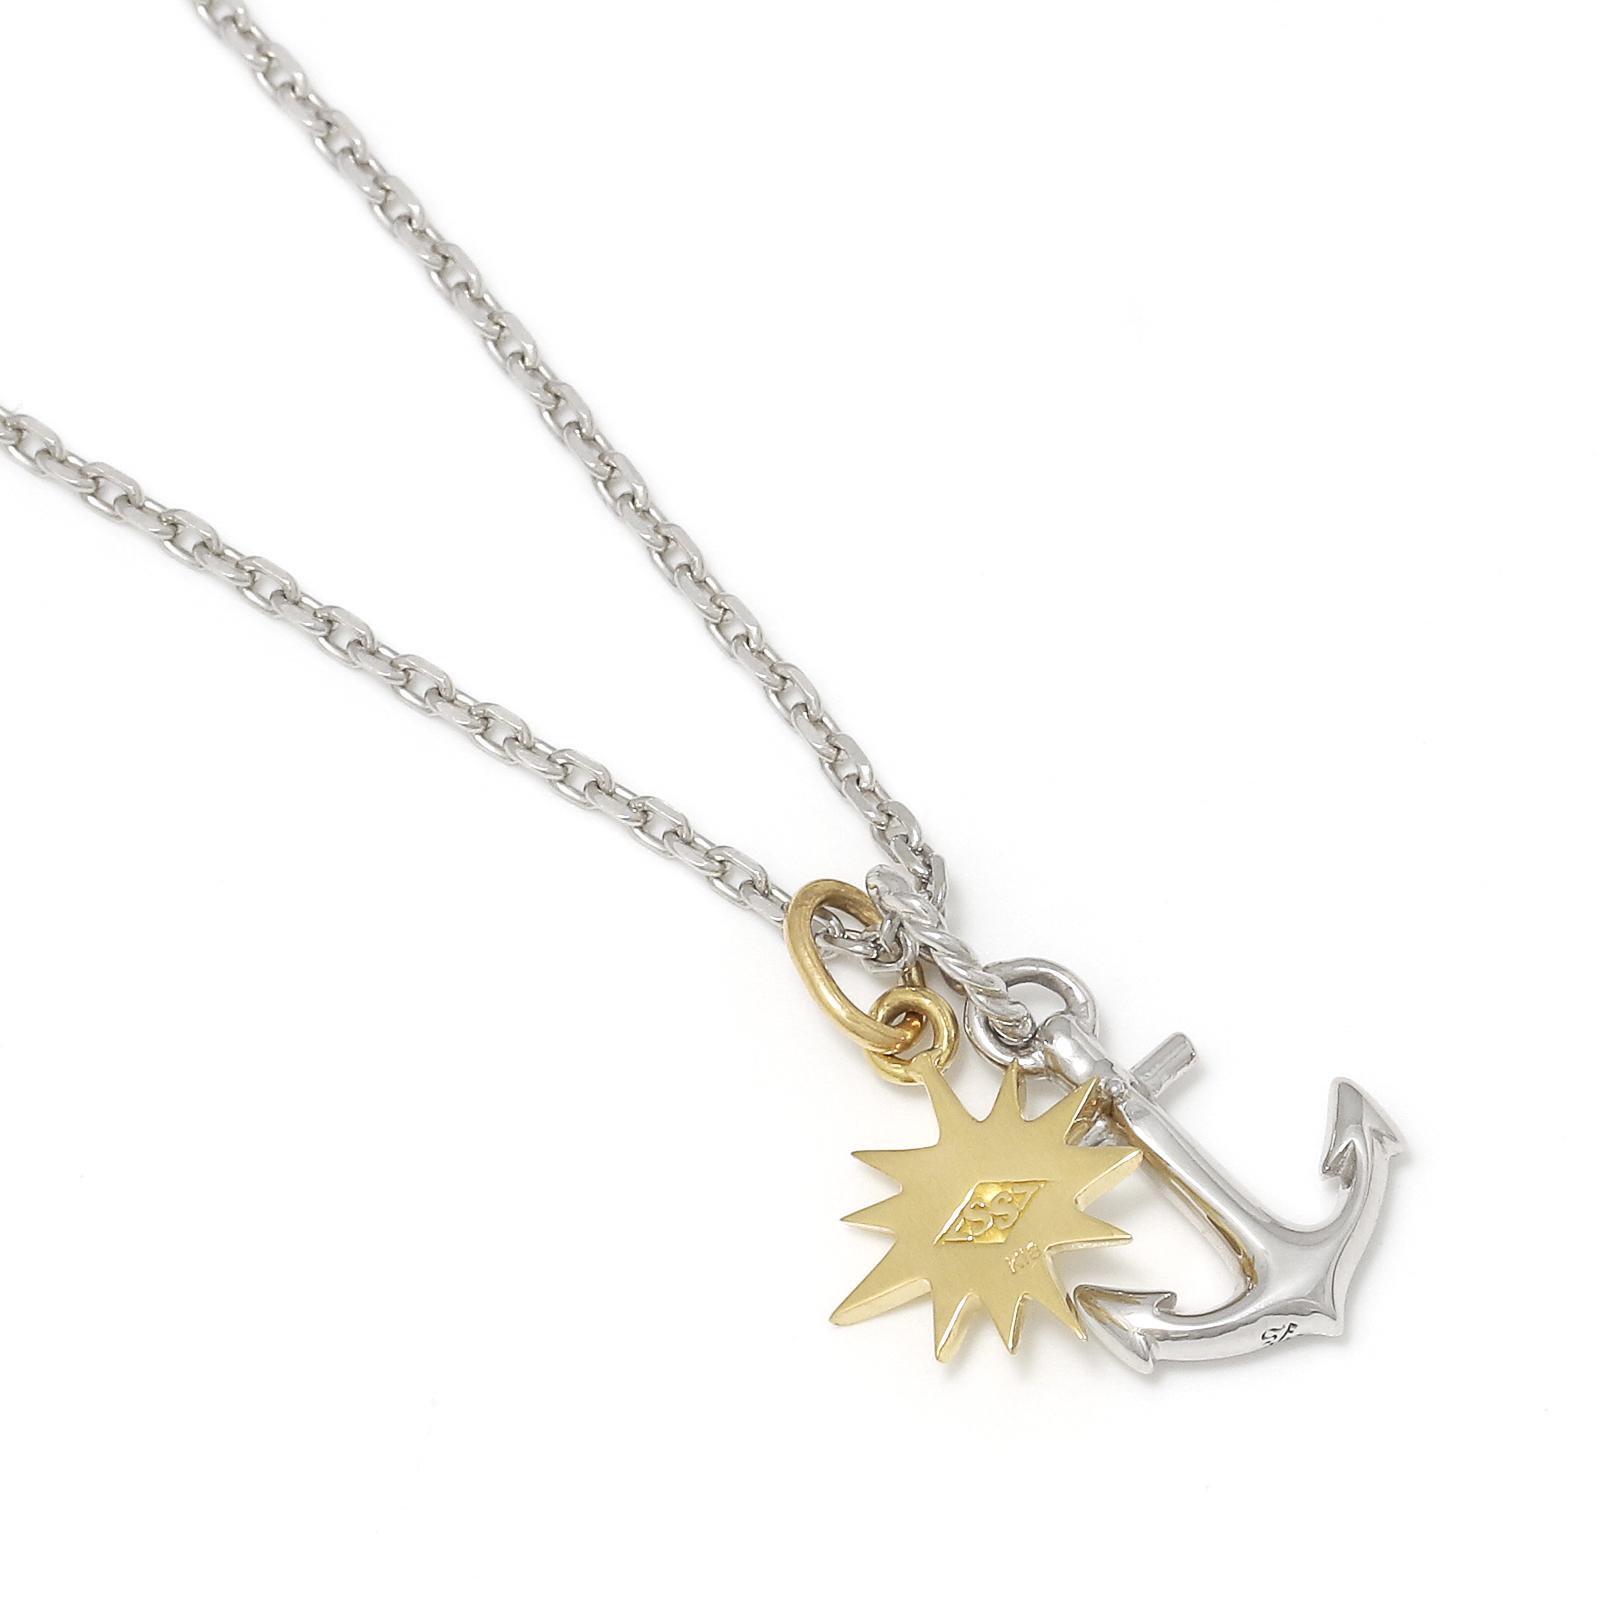 Anchor Pendant - Silver + Small Sun Charm - K18Yellow Gold Set Necklace